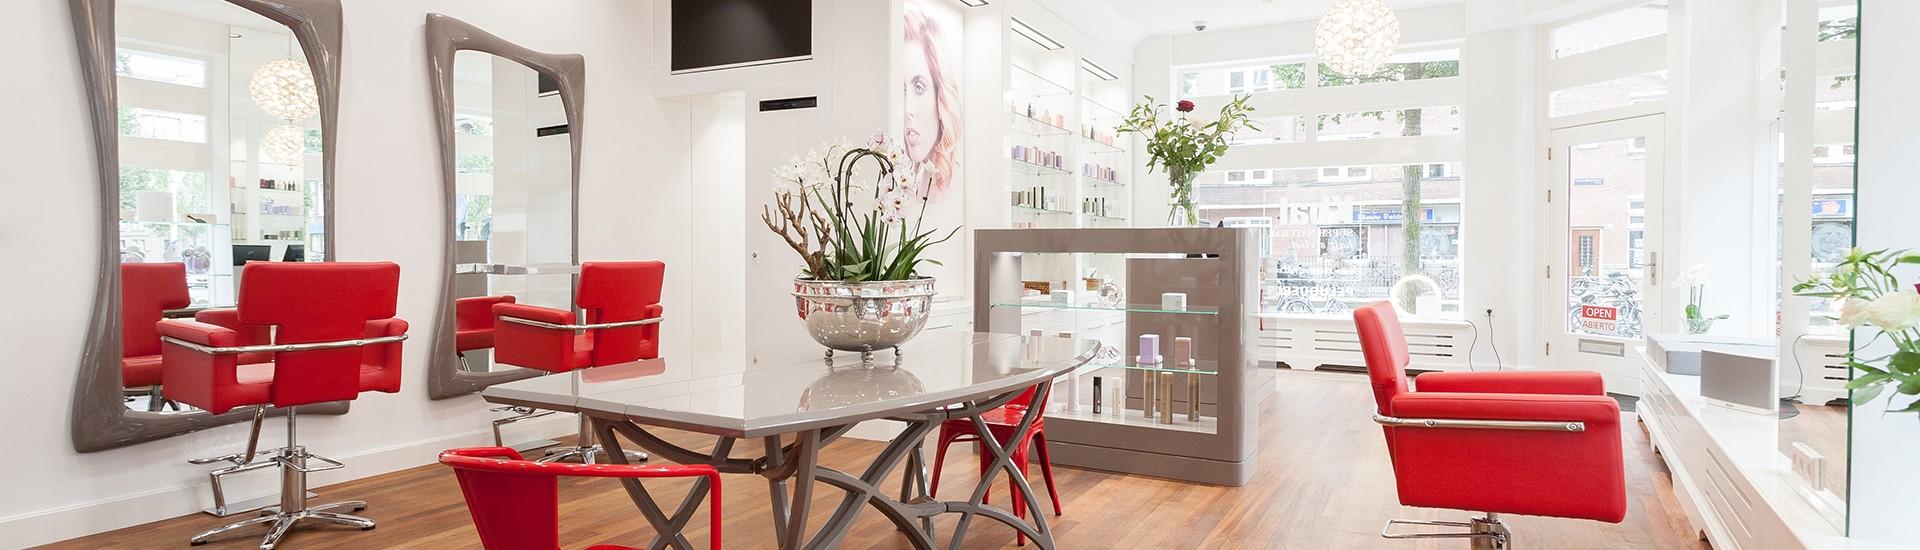 Kbal-hairstylist-Kapsalon-Amsterdam-interieur